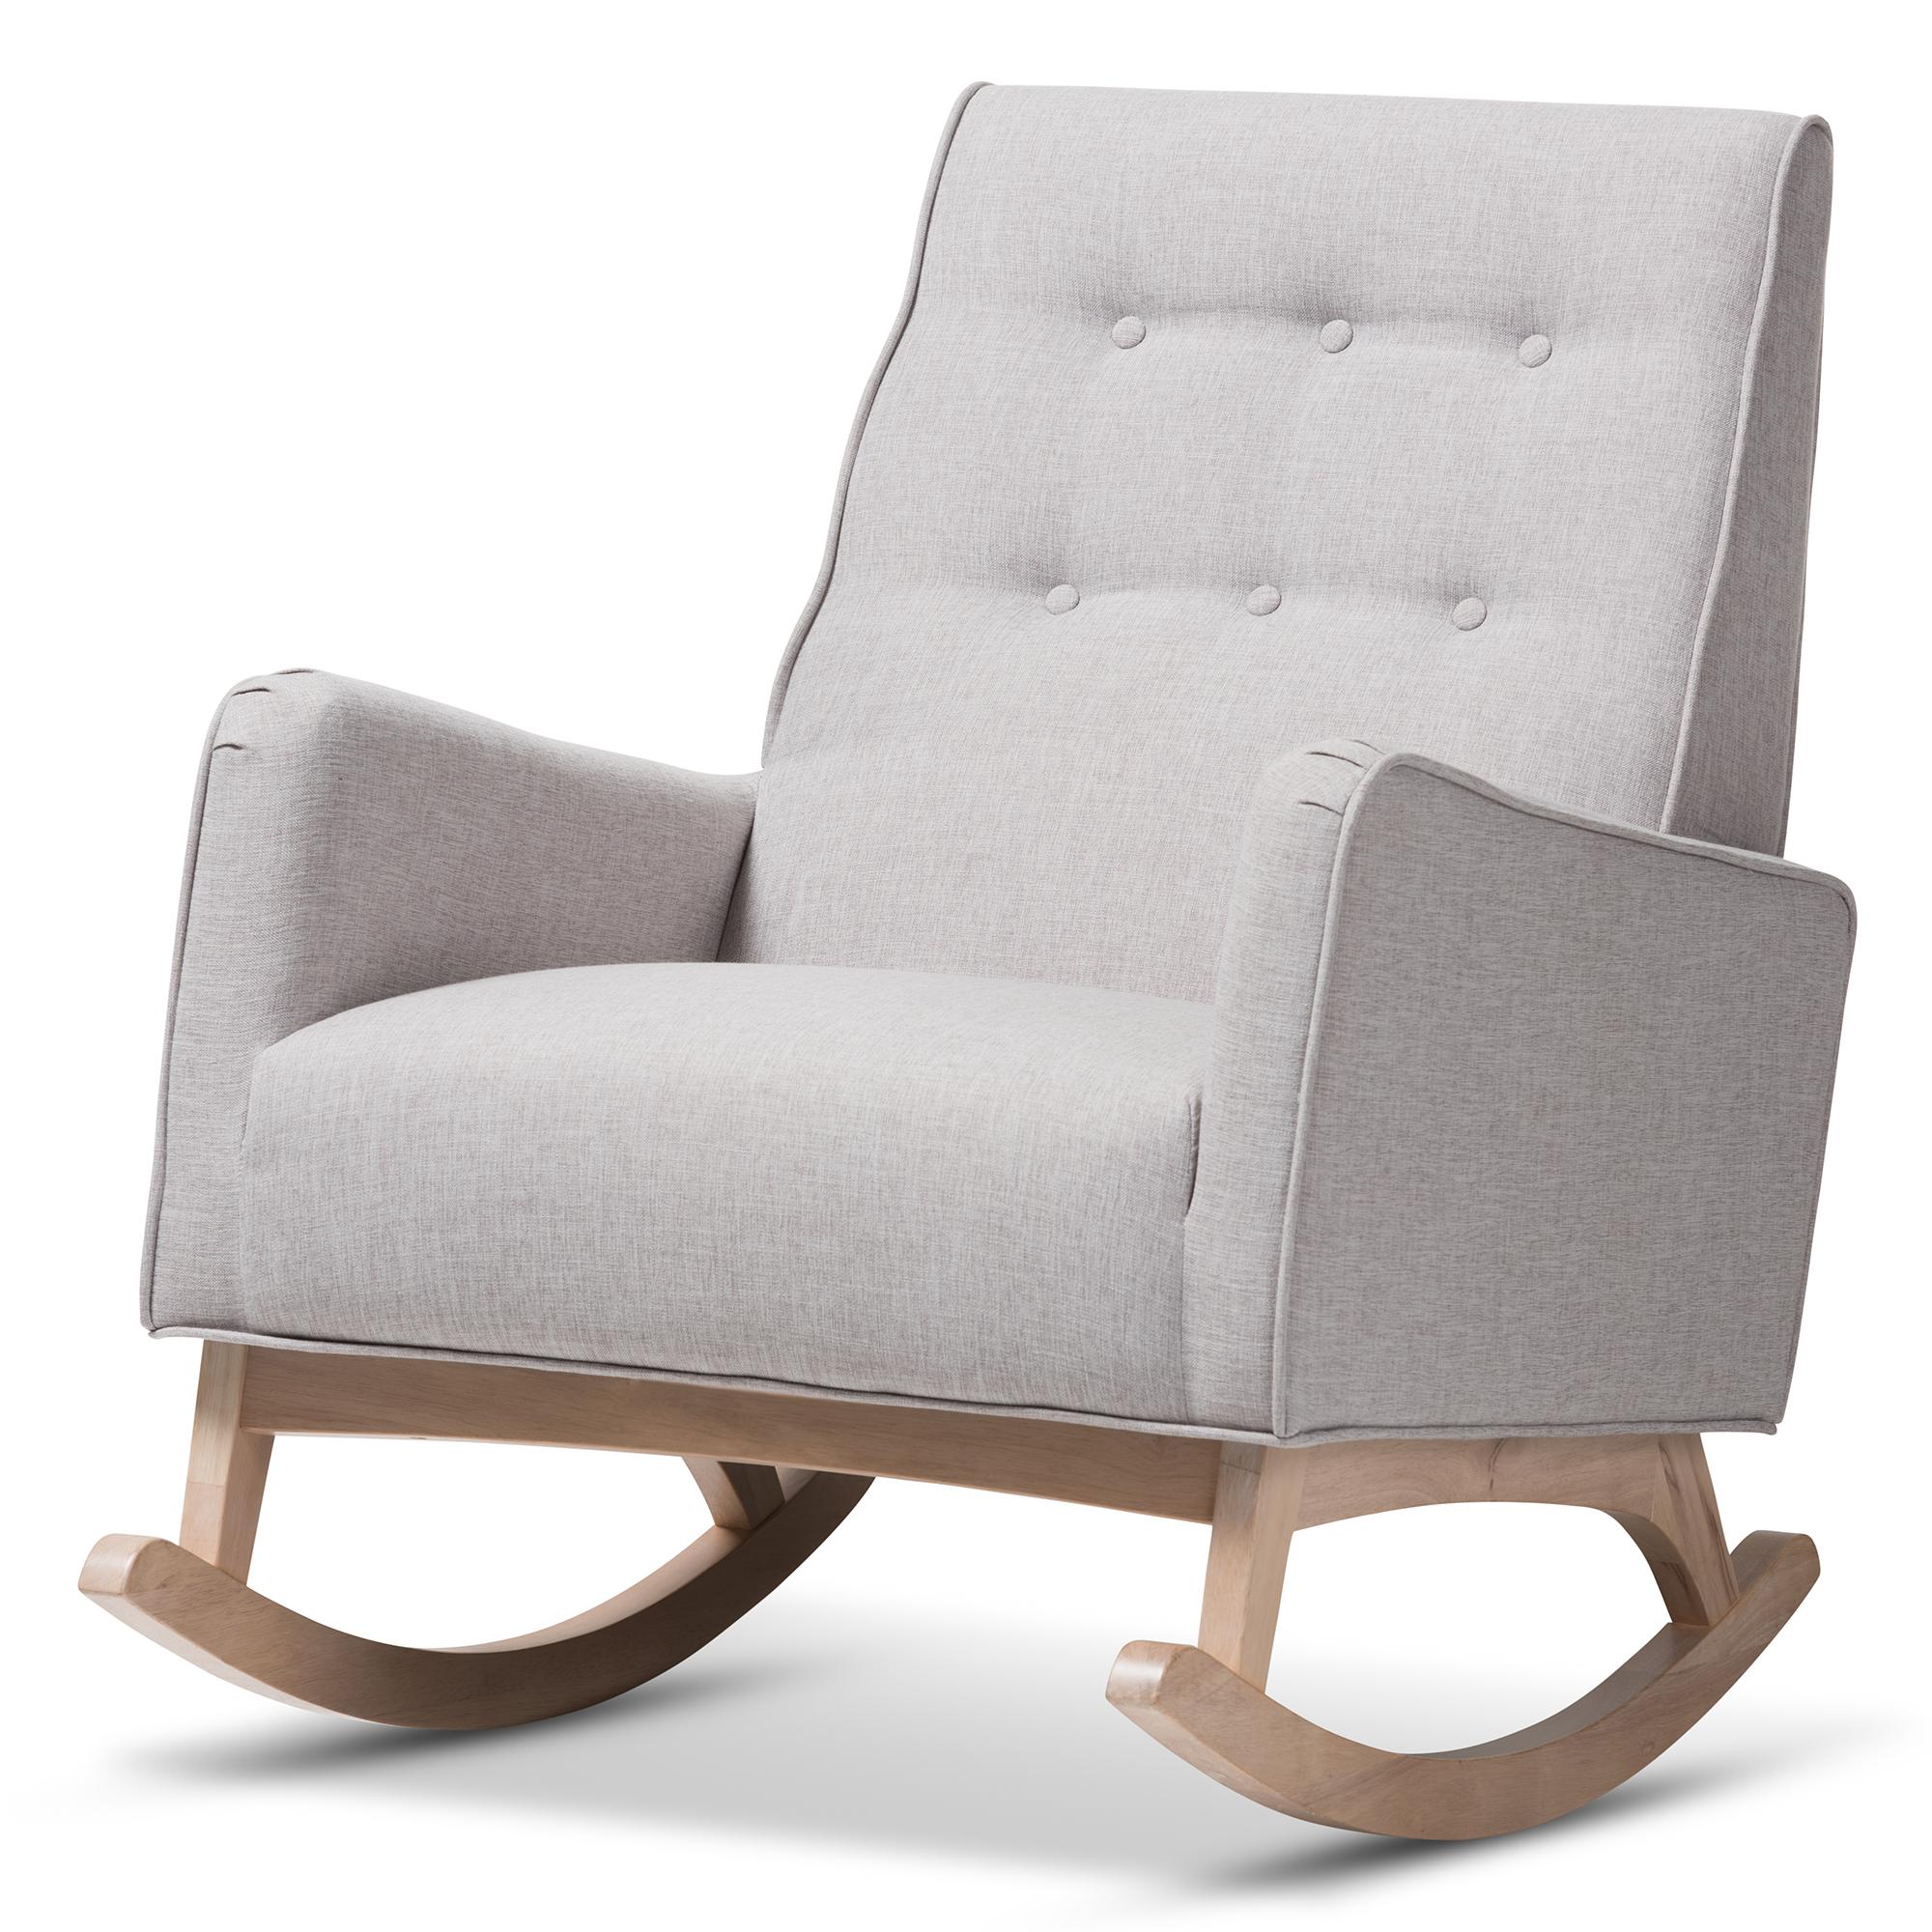 Baxton Studio Marlena Mid Century Modern Greyish Beige Fabric Upholstered  Whitewash Wood Rocking Chair Affordable